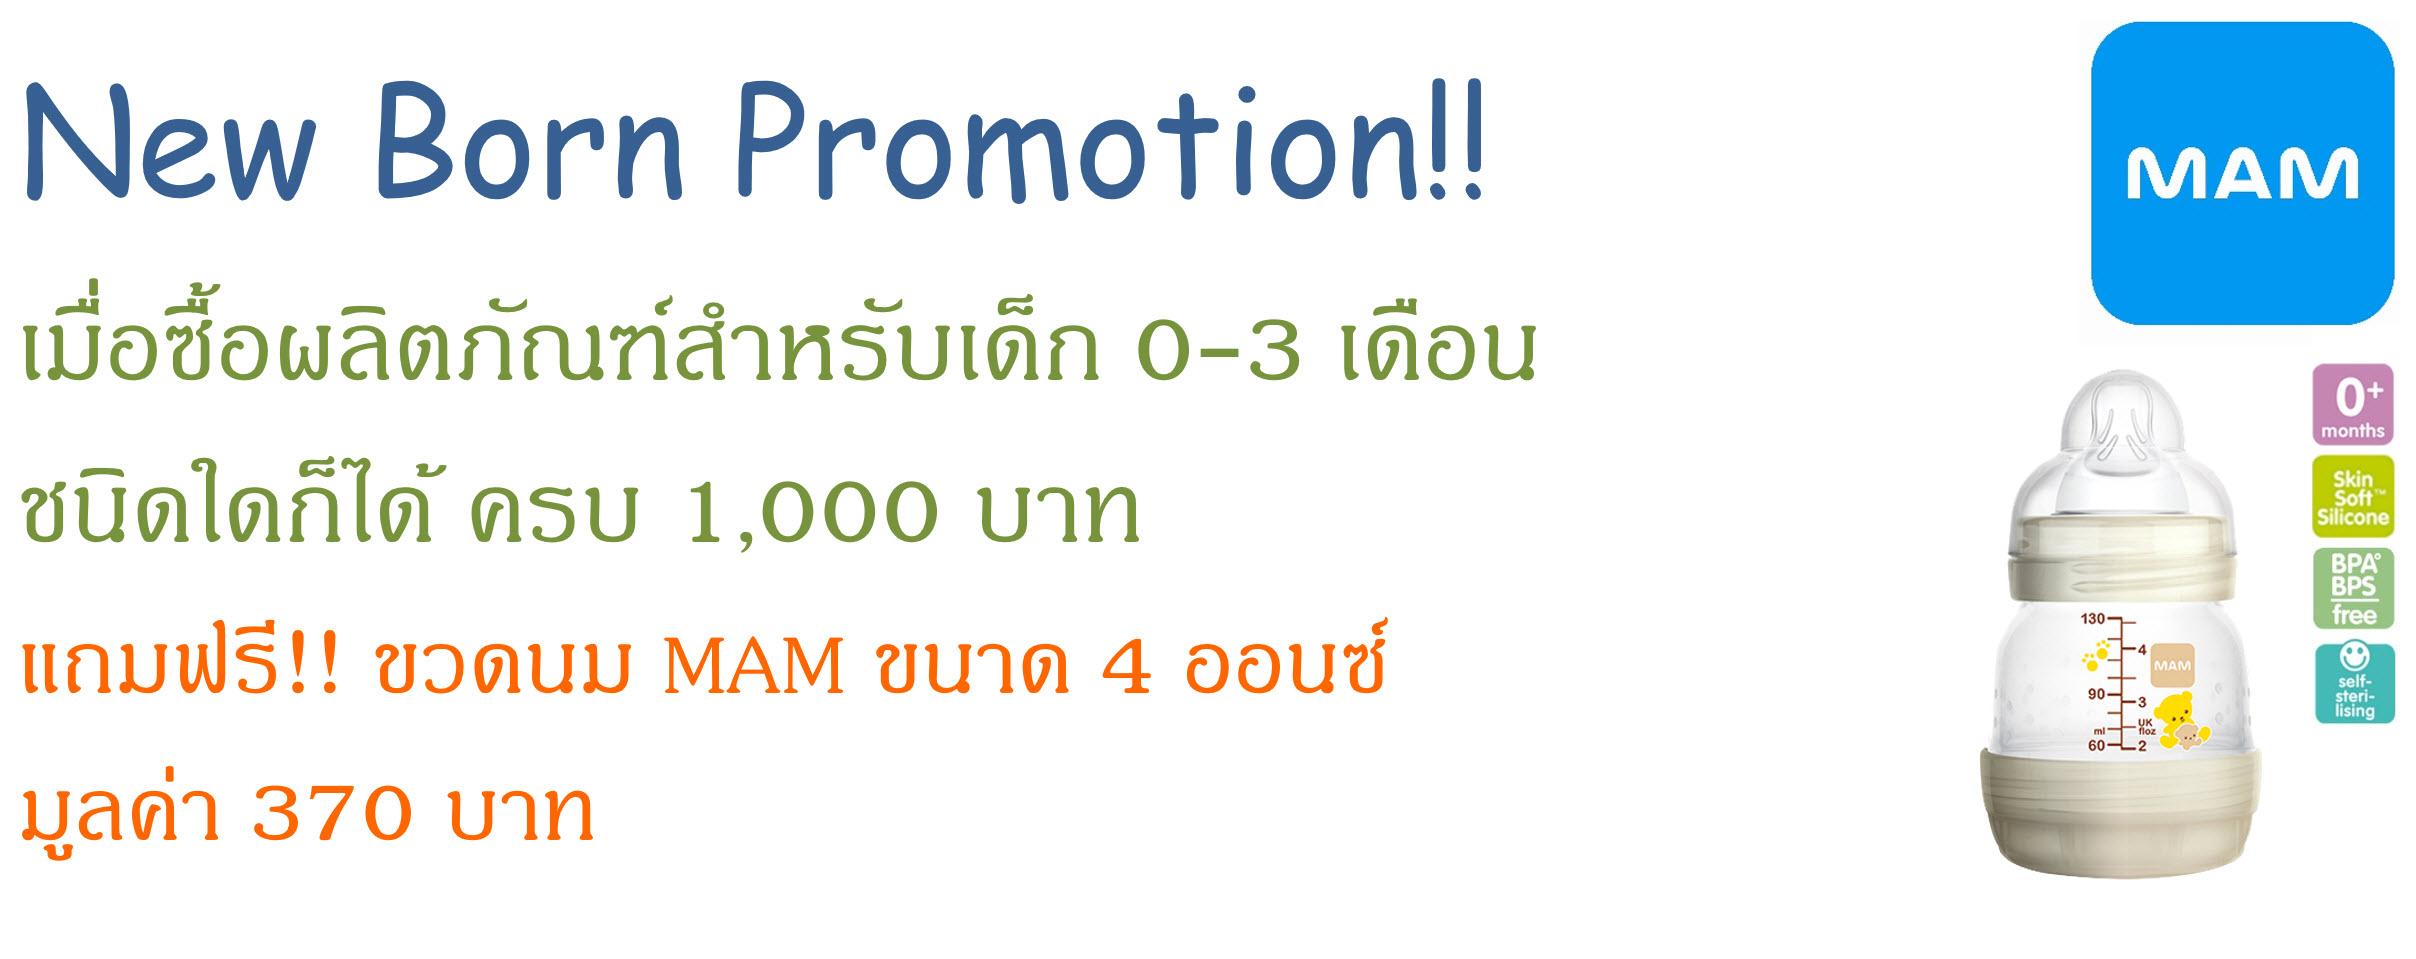 New Born Promotion